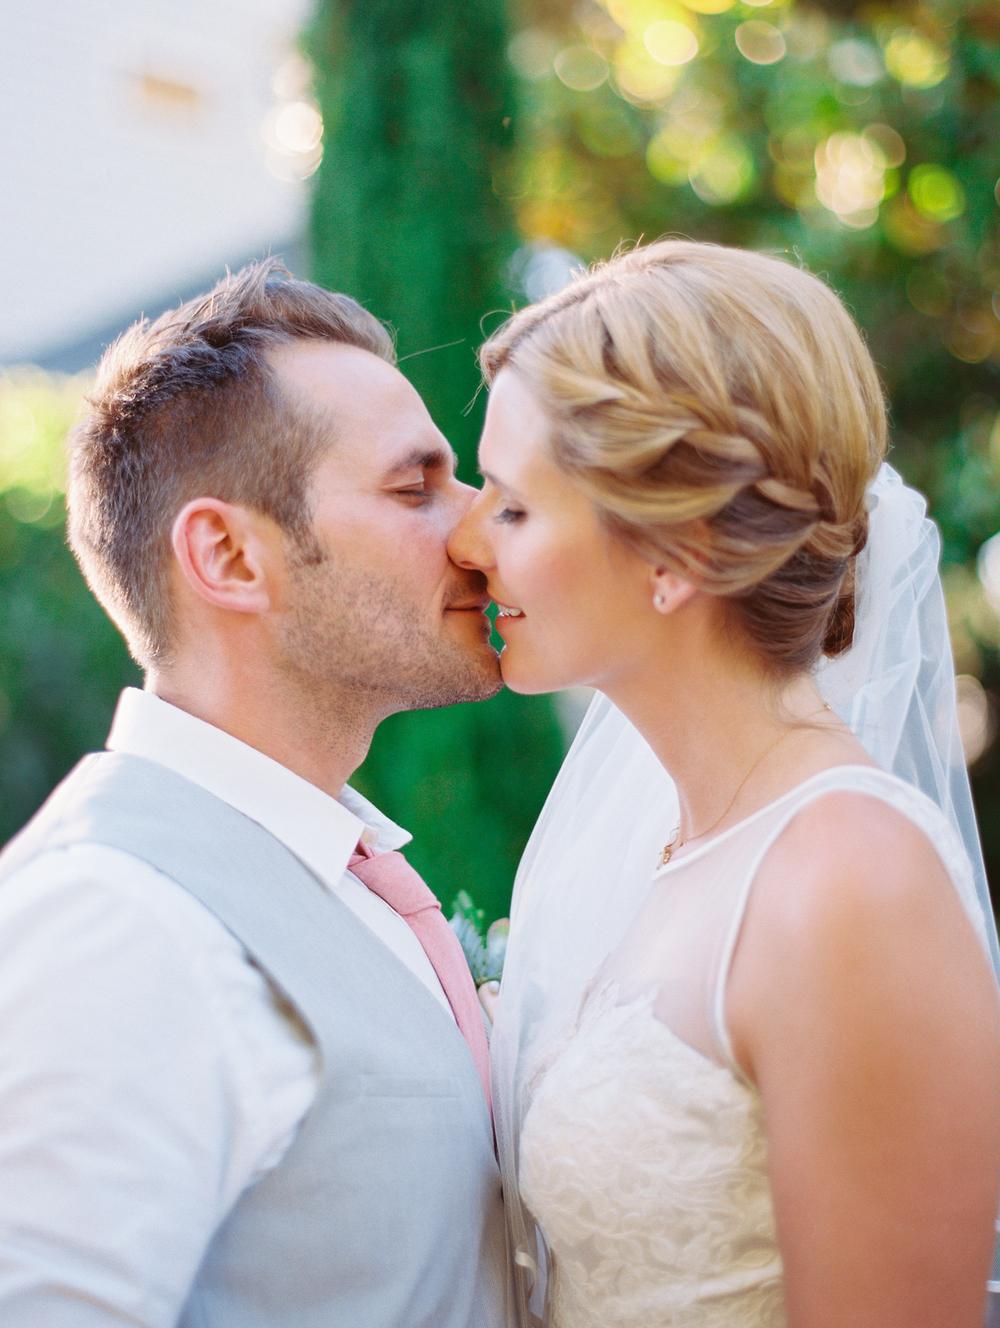 Anders Wedding by Jessica Garmon-363.JPG